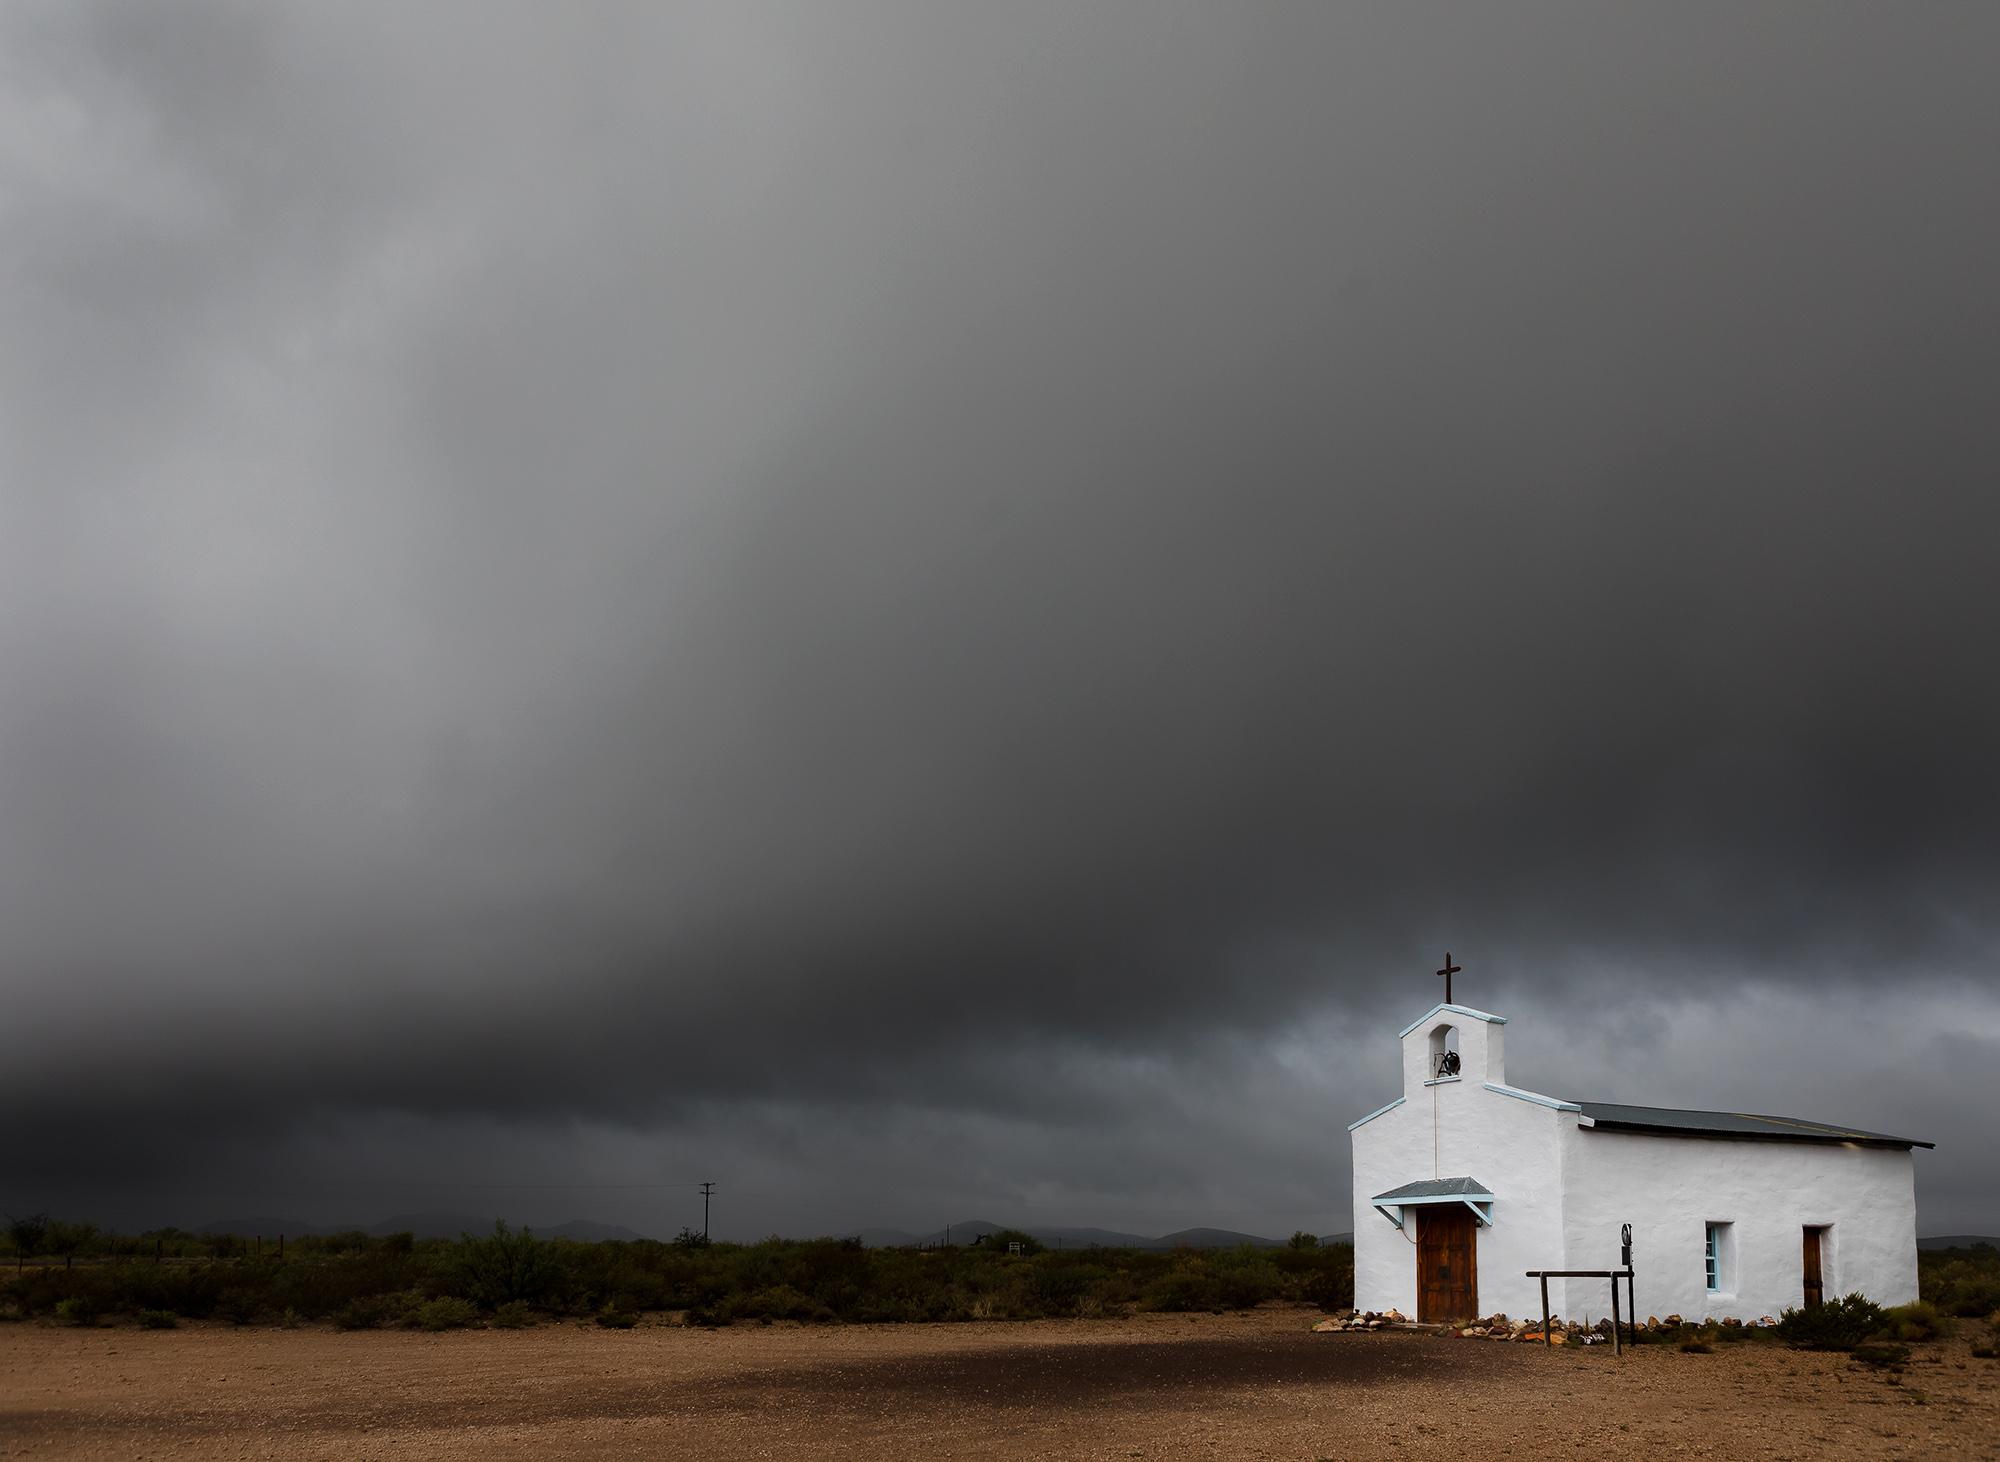 West Texas | September 2018